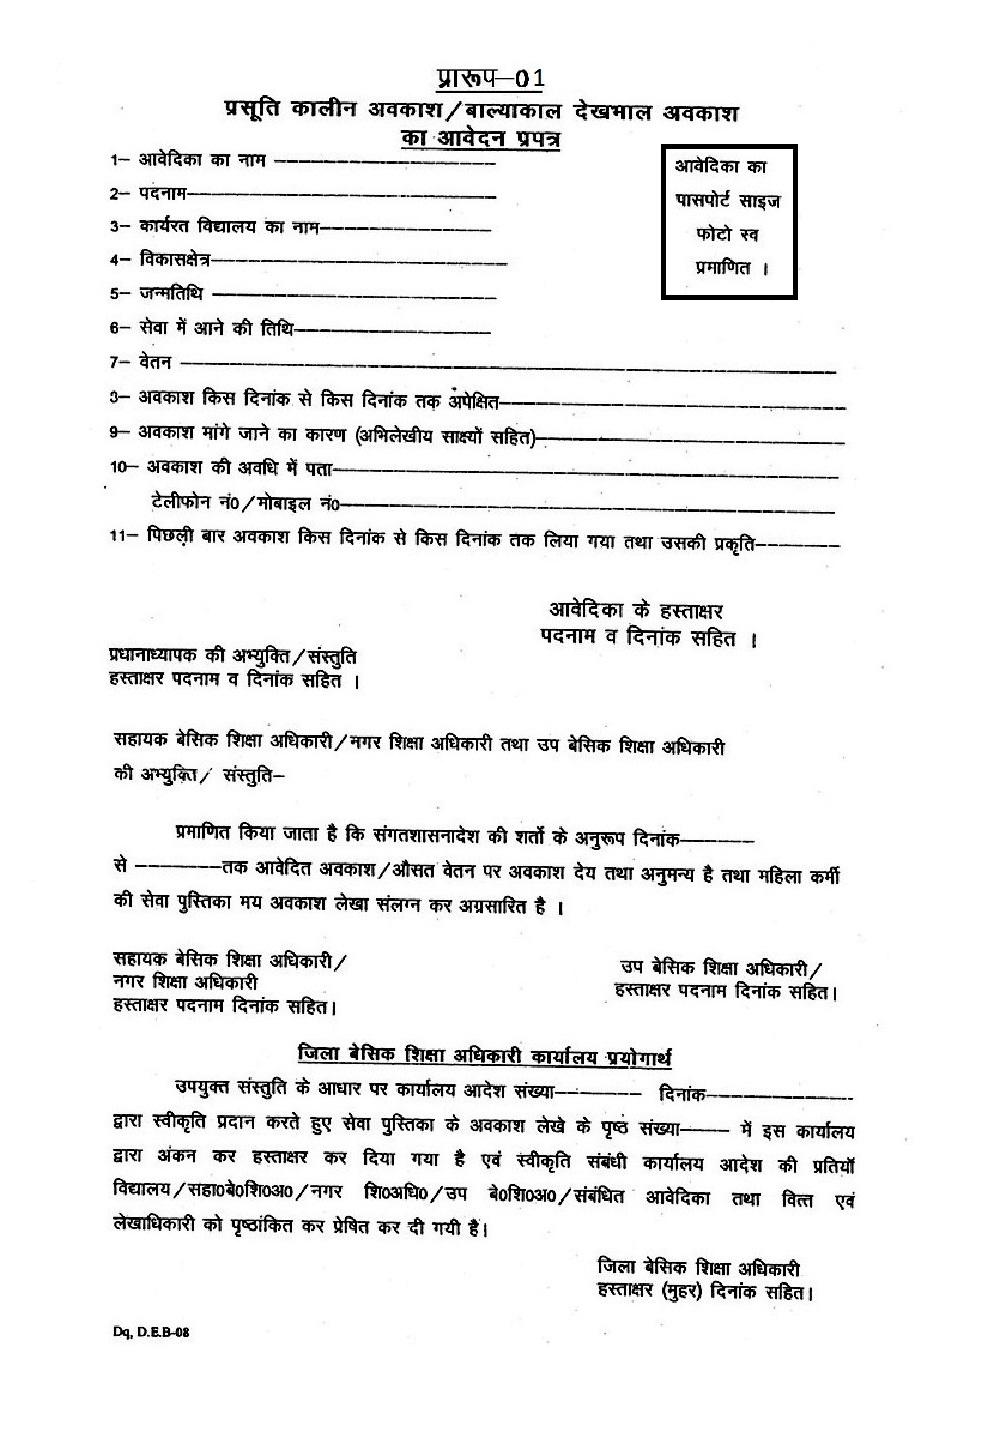 How to write avedan patra in hindi